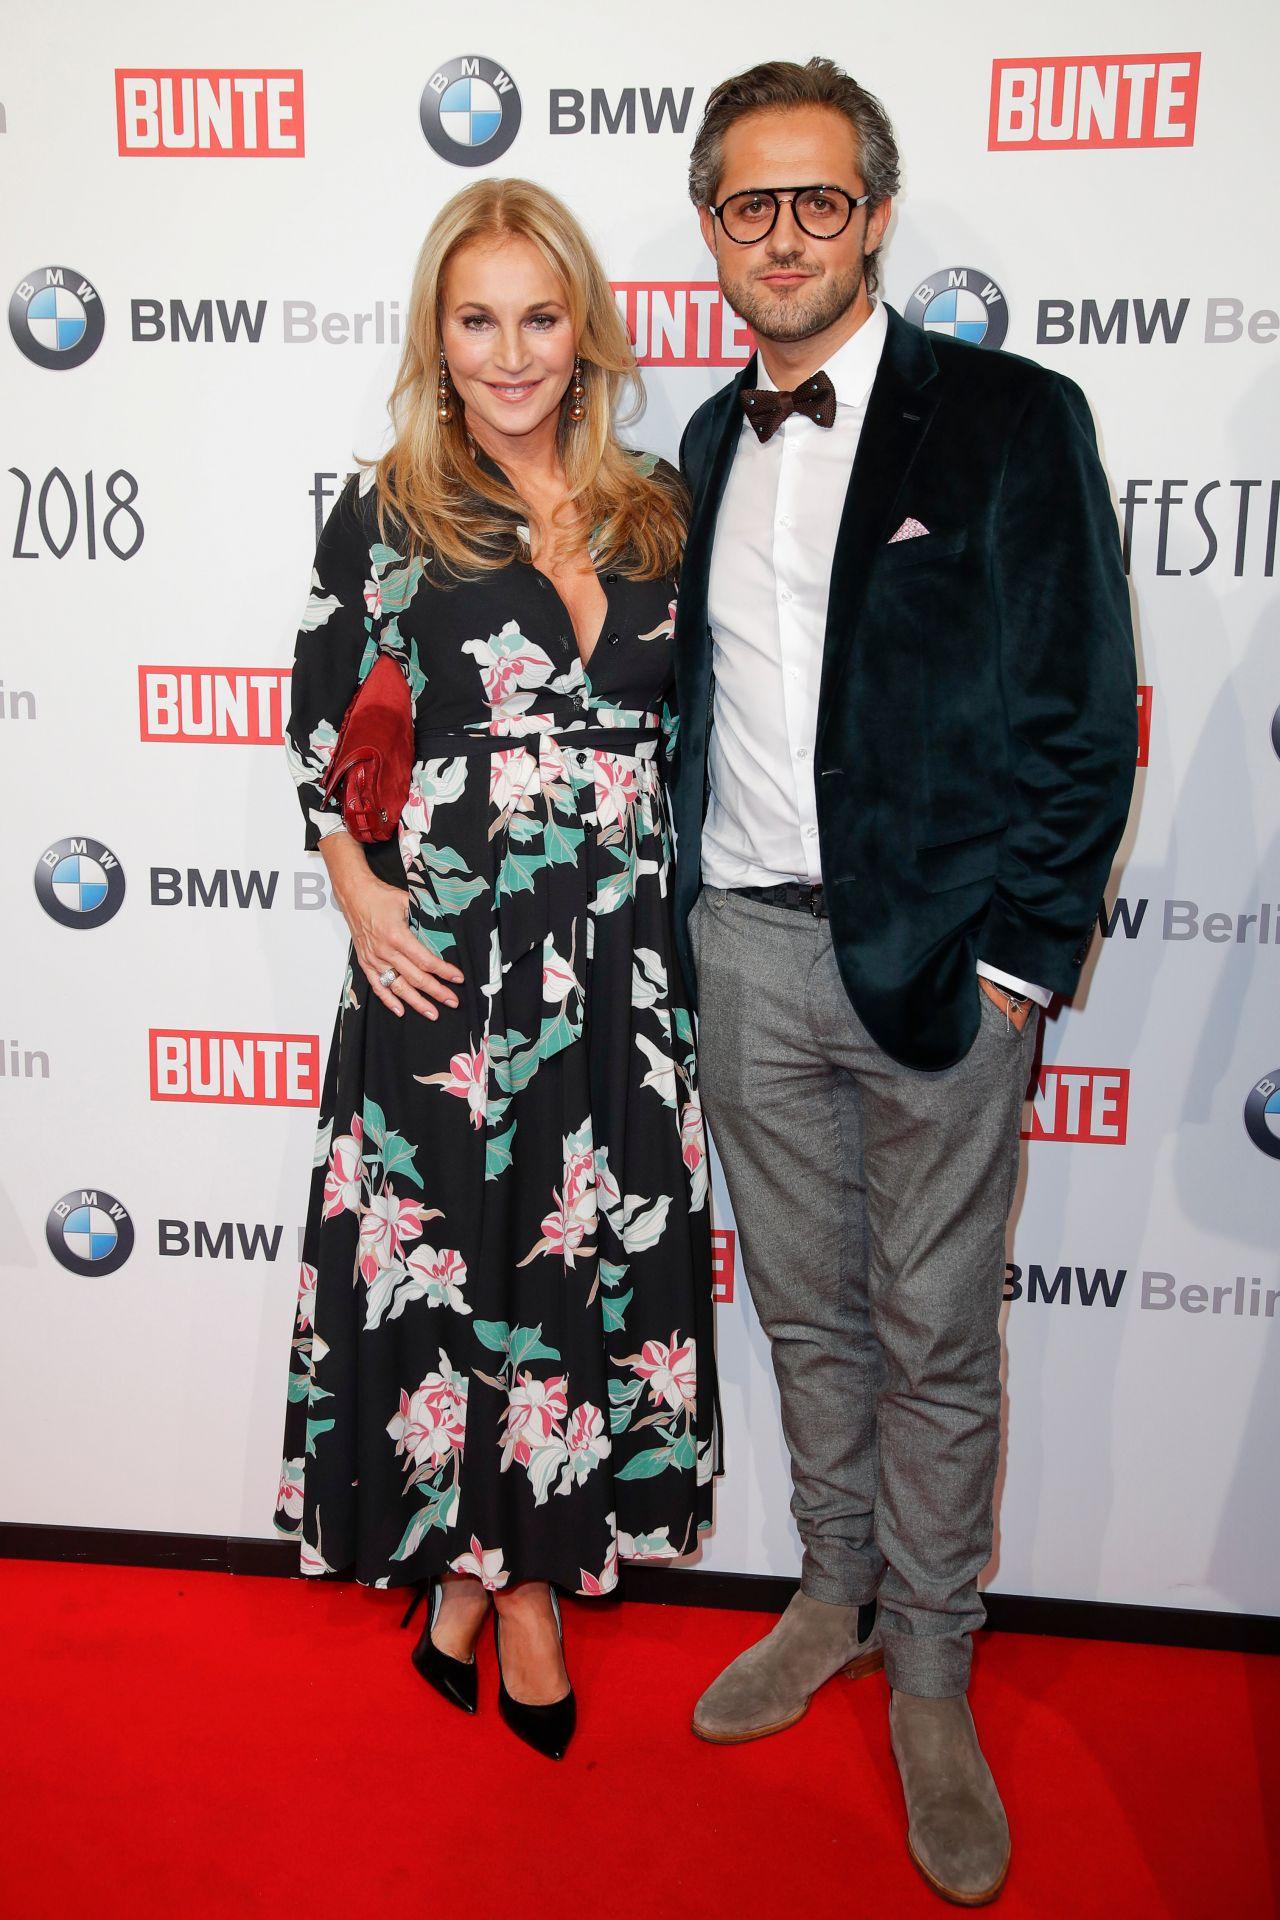 Caroline Beil - BUNTE & BMW Host Festival Night 2018, Berlinale 2018